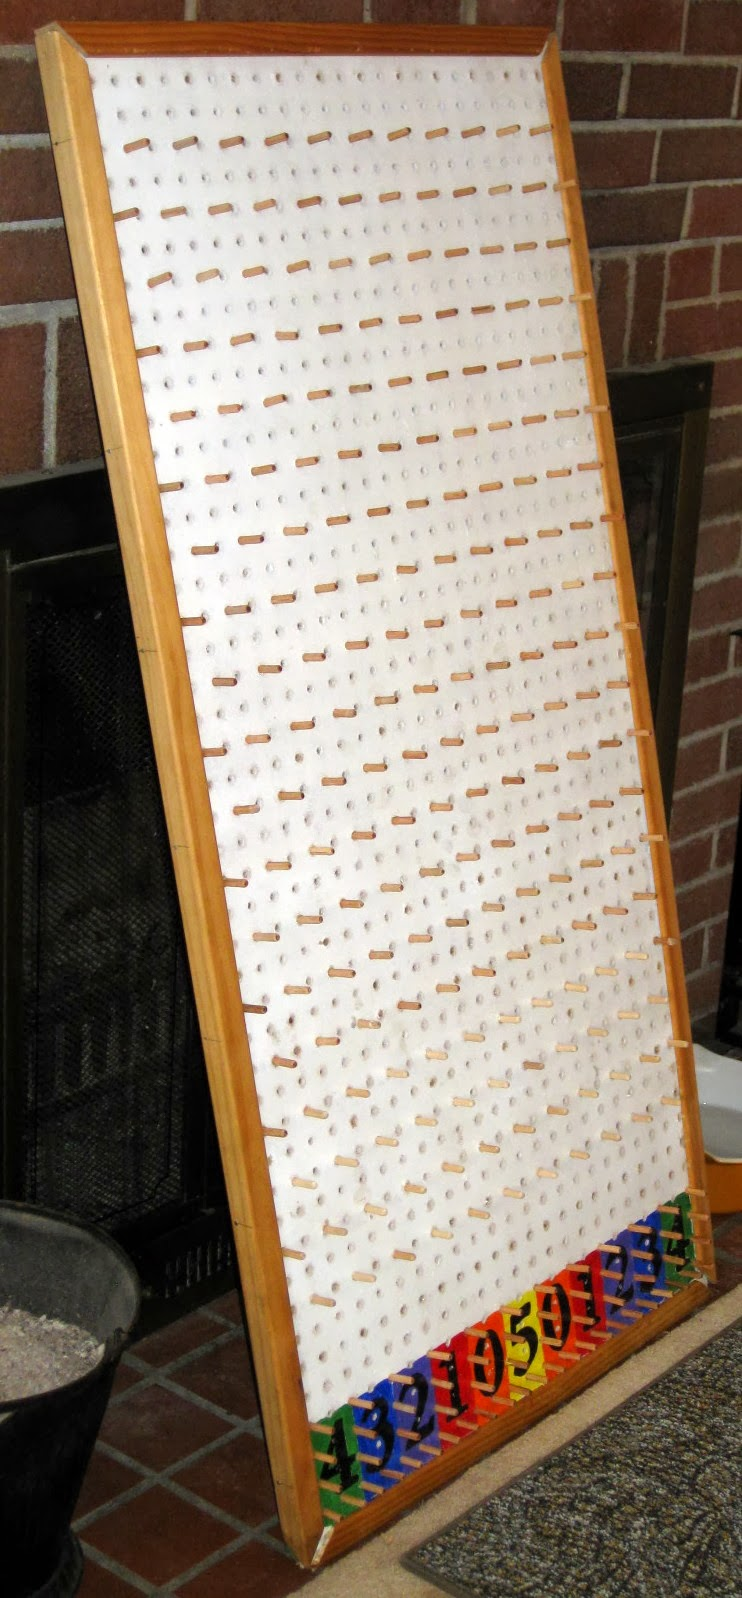 How I Made My Plinko Board Homemade Plinko Board For Carnival